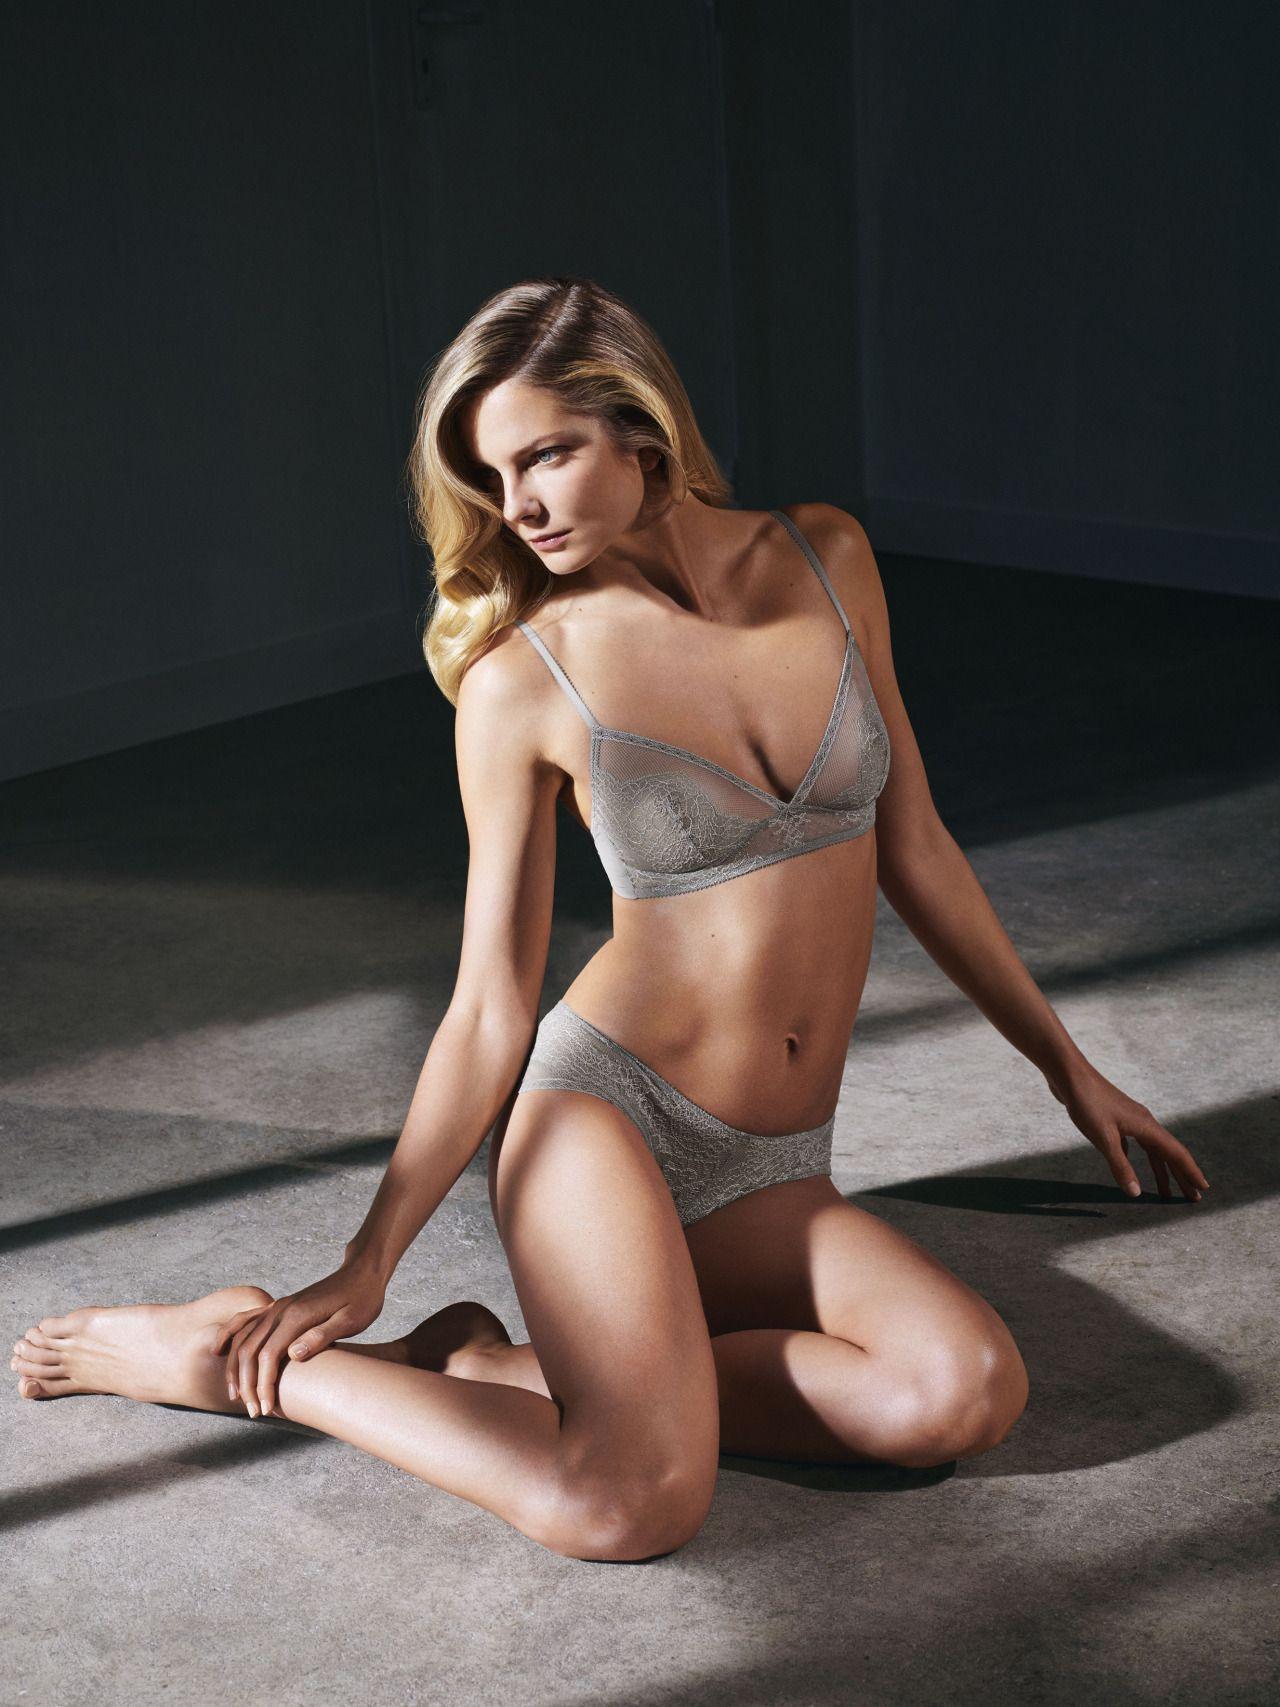 Eniko mihalik see through sexy pics naked (78 images)